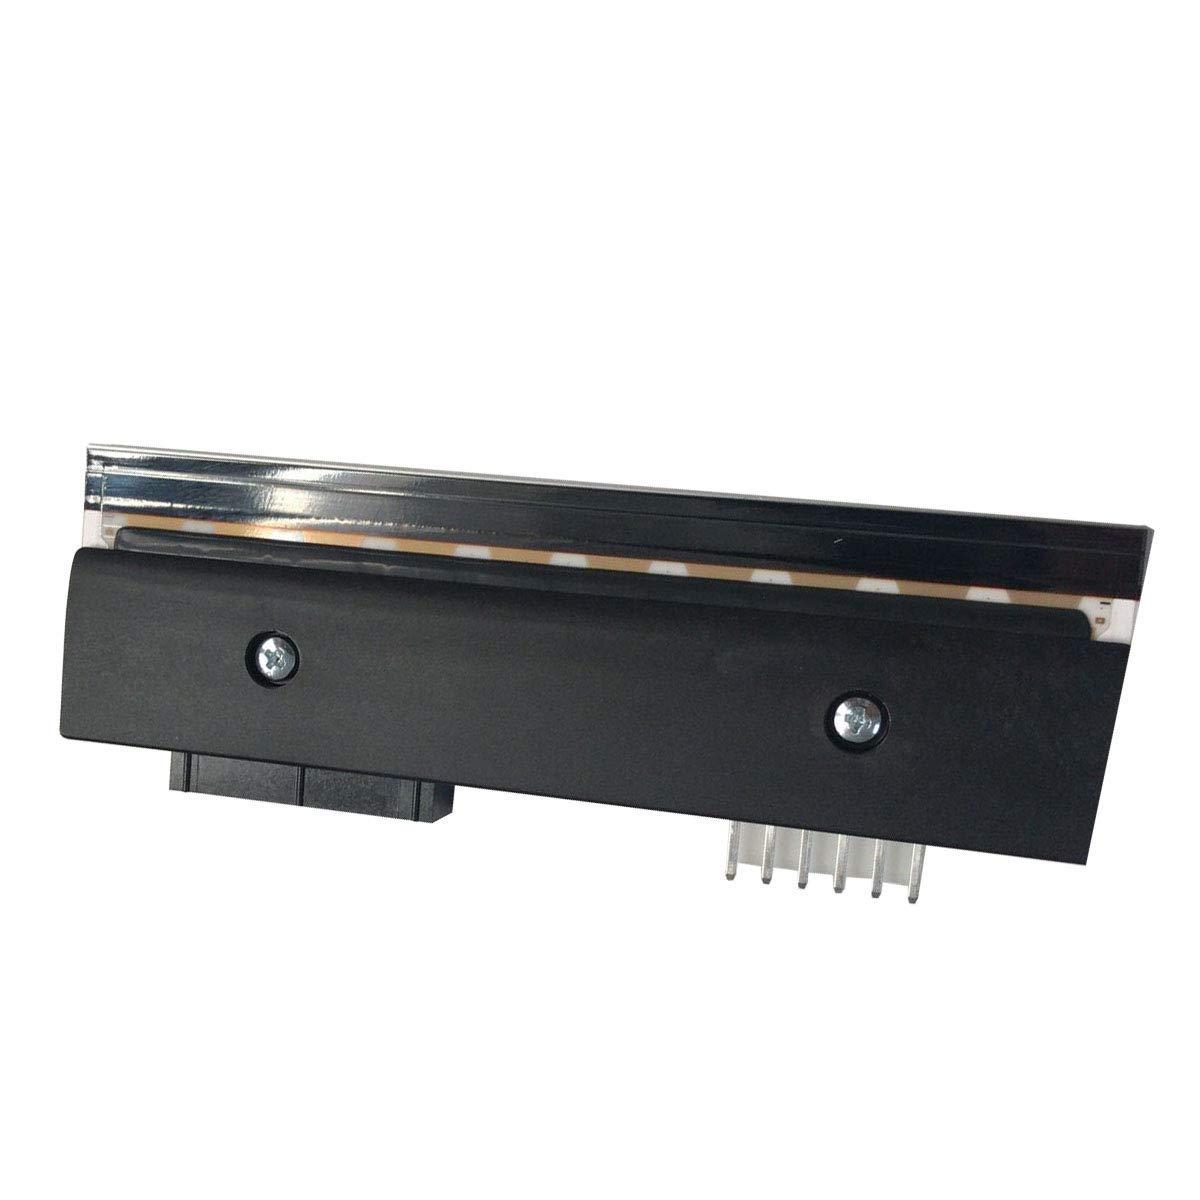 Printhead for CAB M4 CAB A3 Thermal Label Printer 300dpi ROHM KD3004-DC91 KF3004-GL50B Print Head